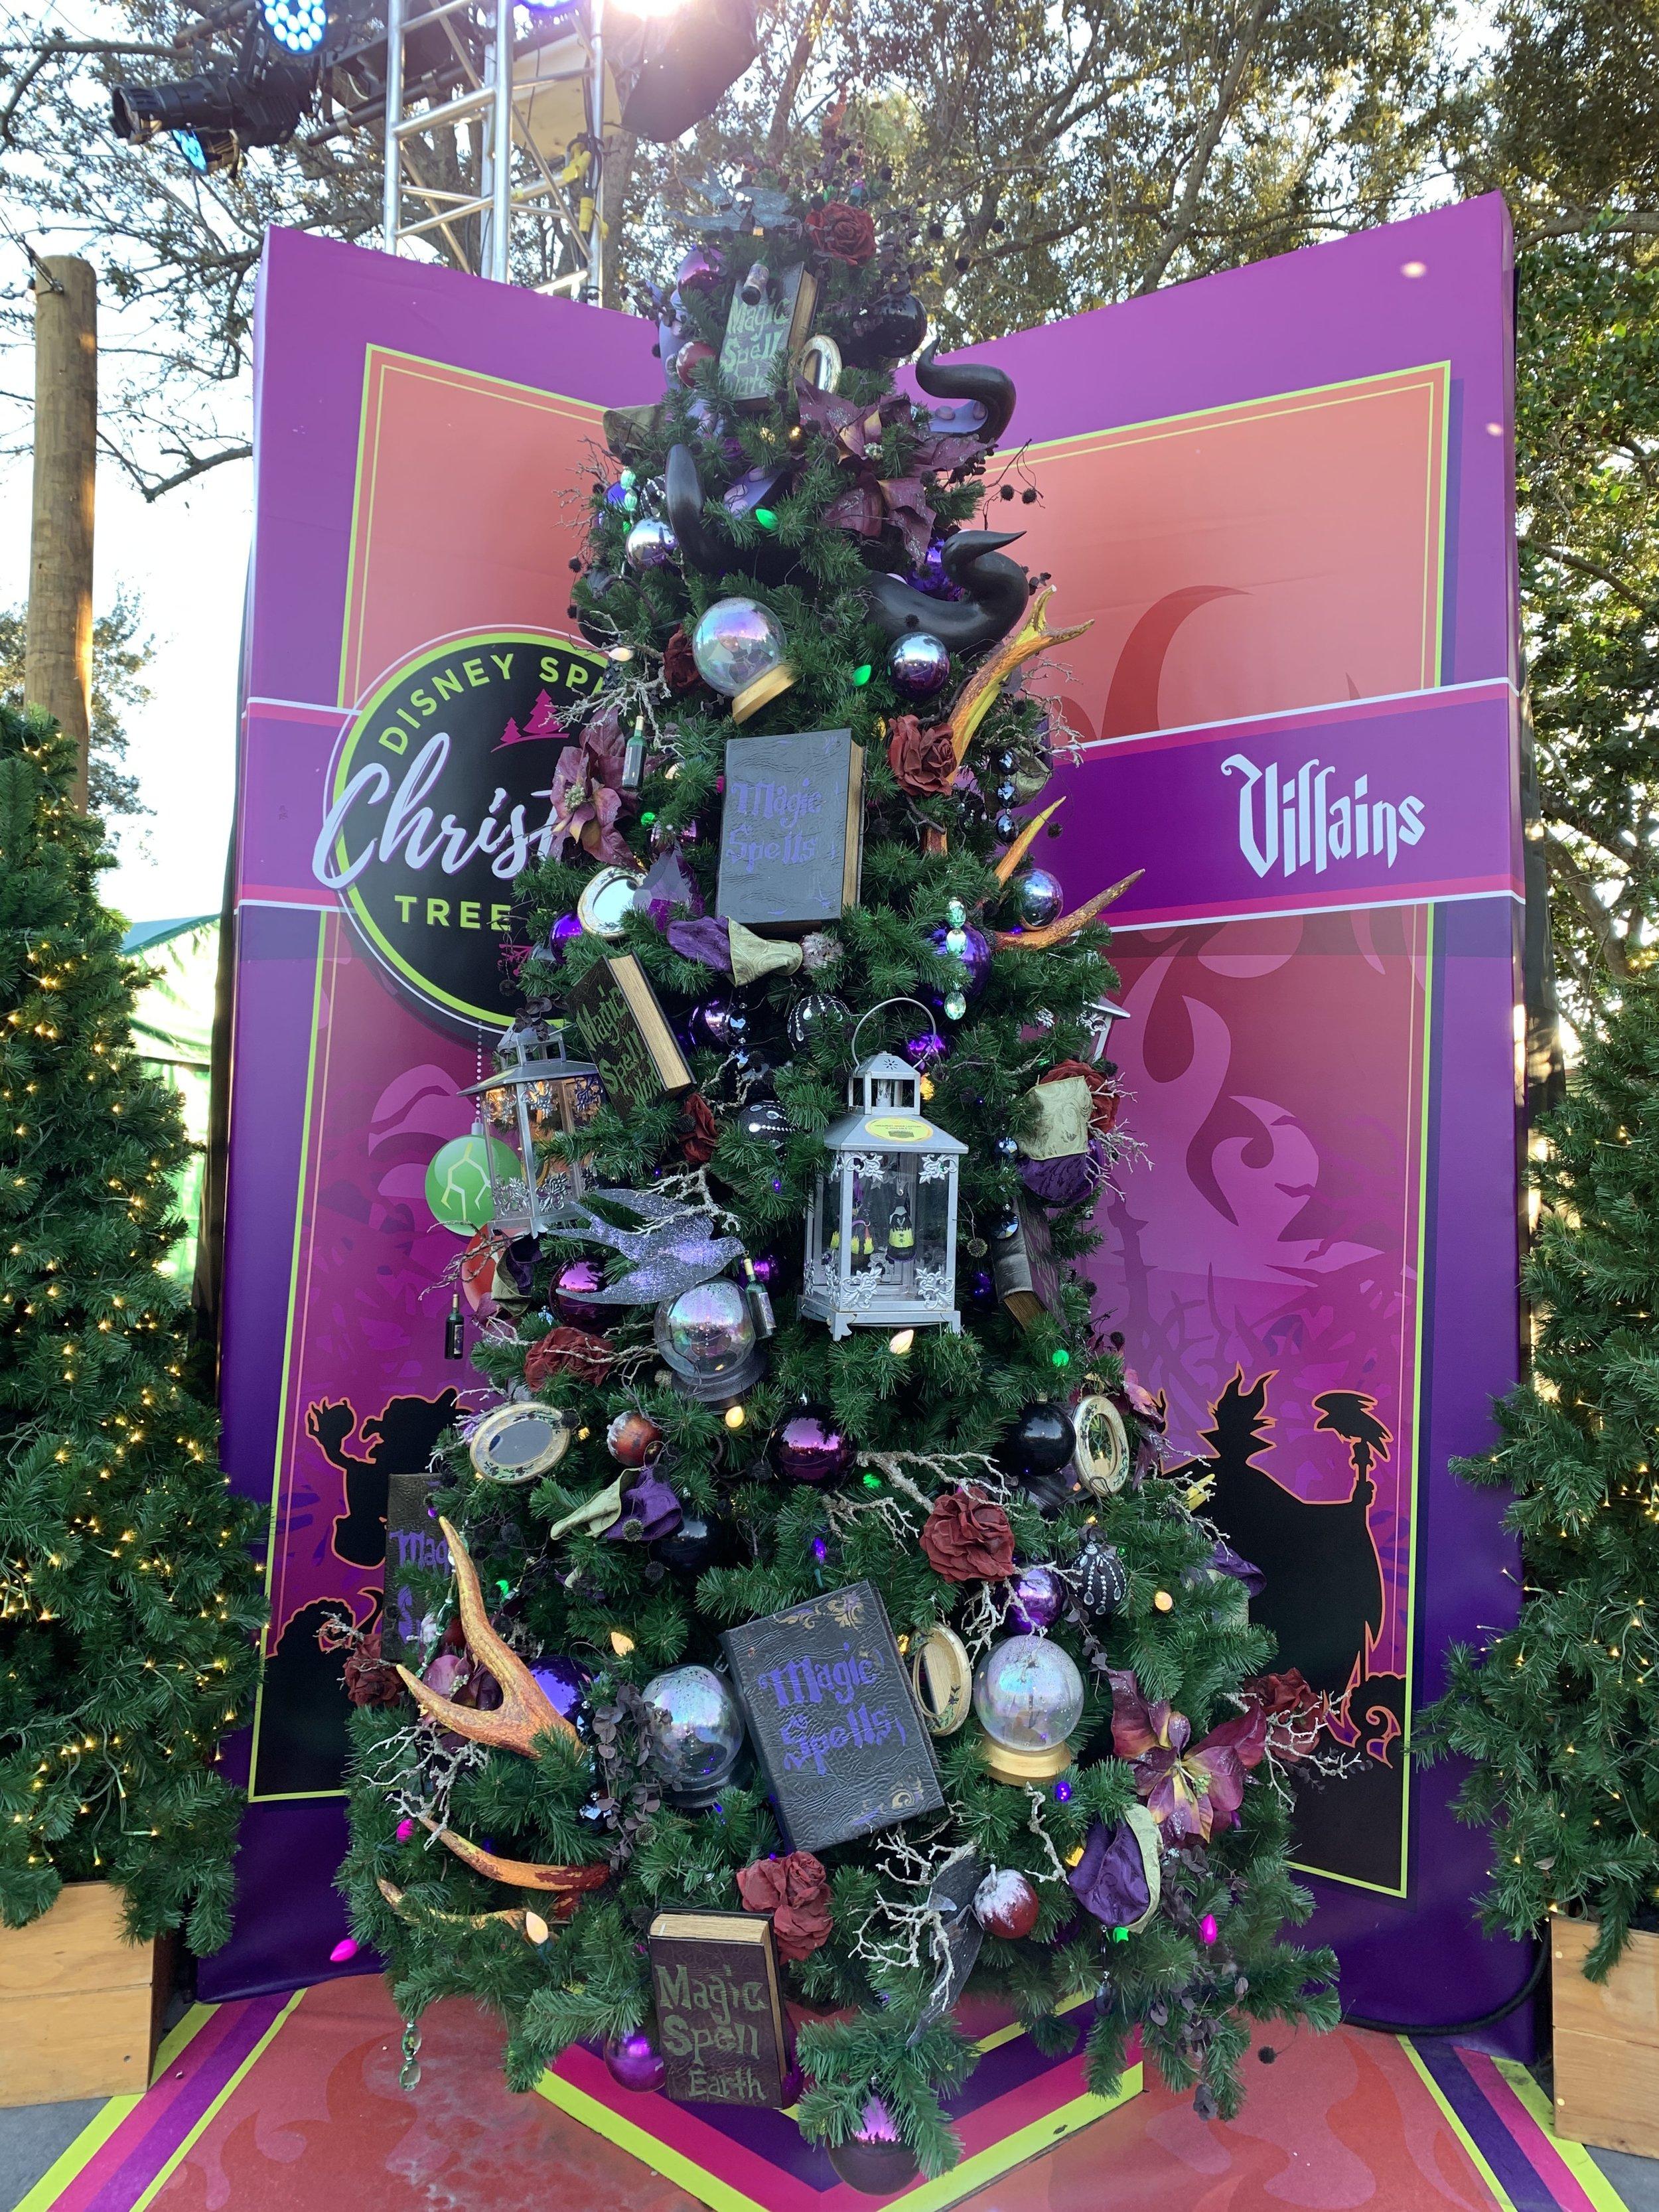 Disney's Villains Tree